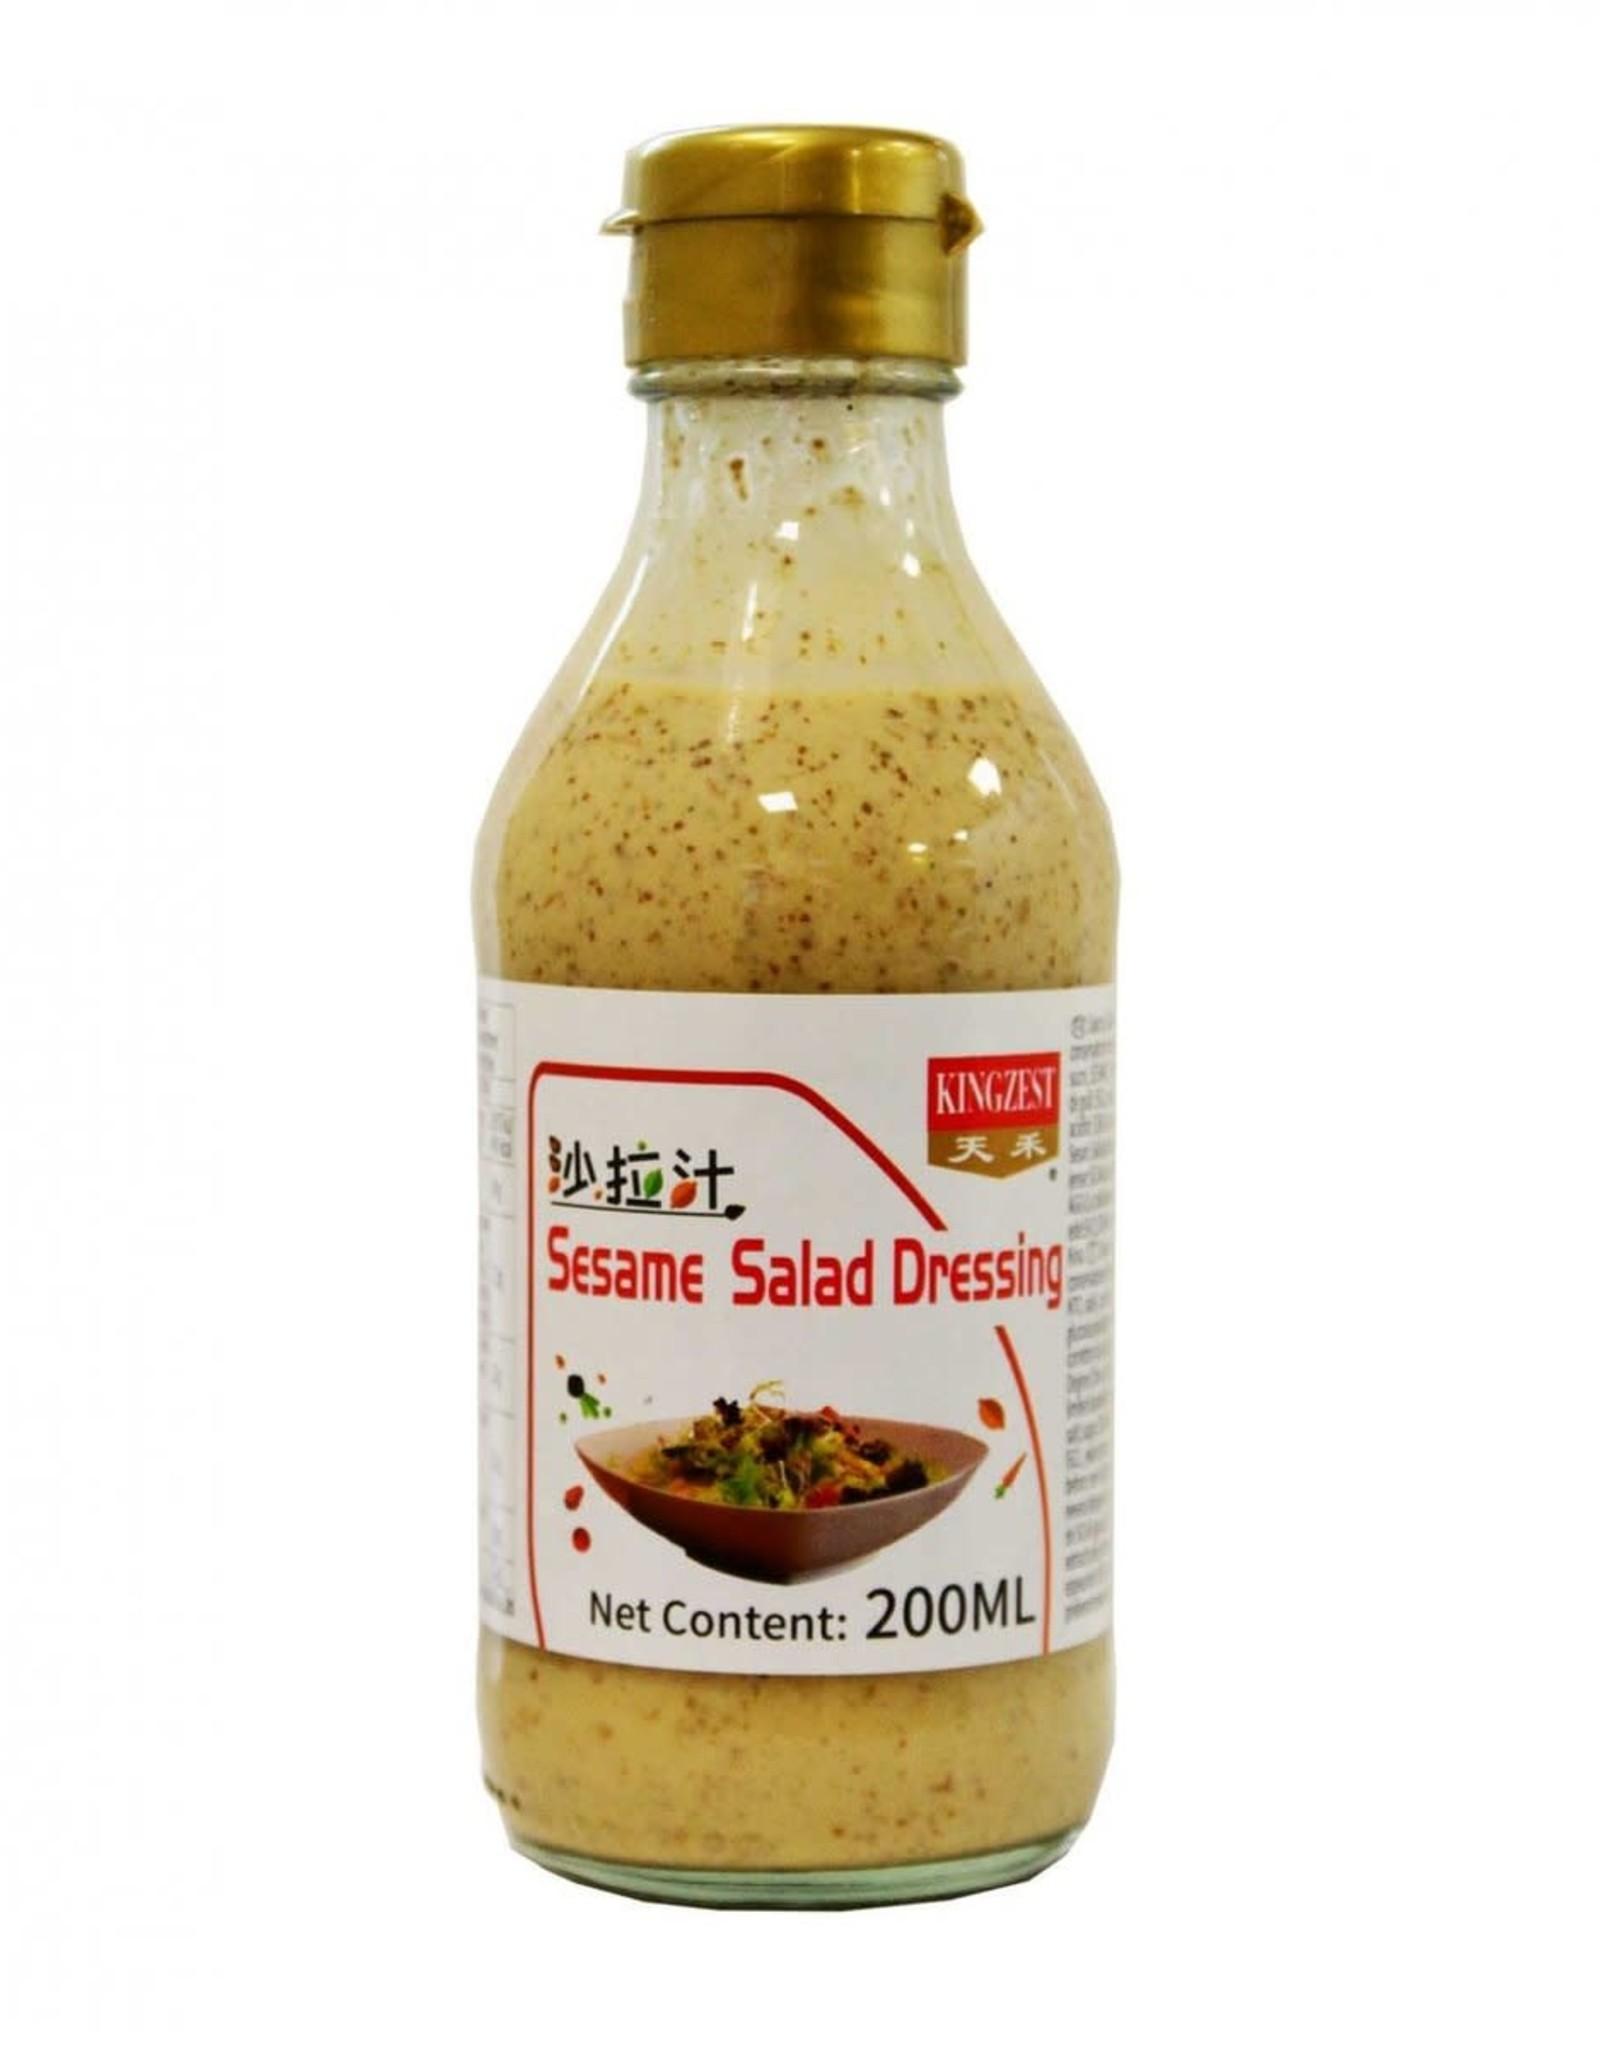 Kingzest Sesam Salade Dressing 200ML KINGZEST